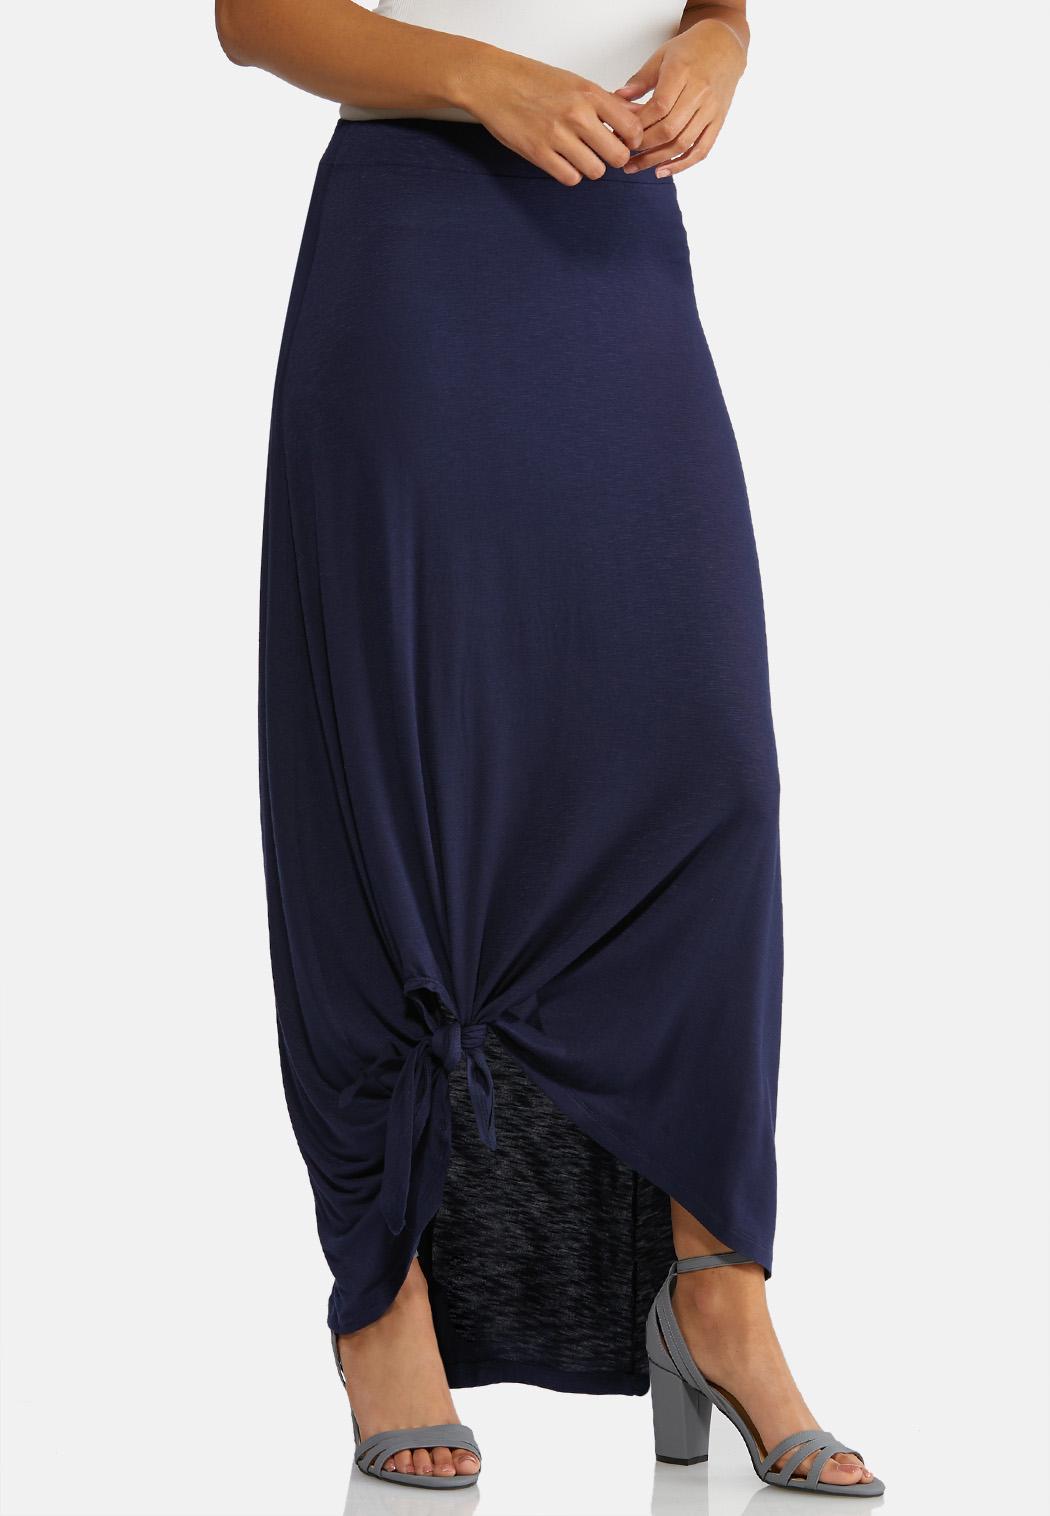 Knotted Hem Maxi Skirt